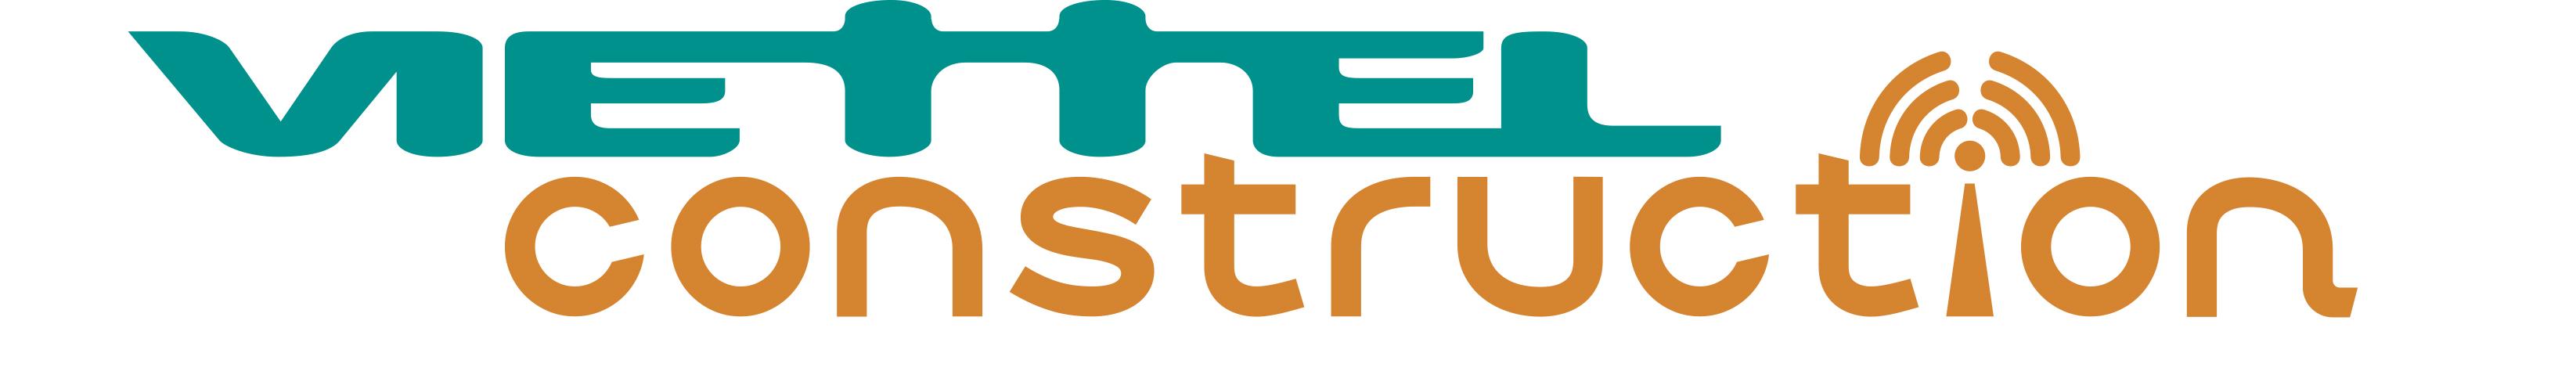 Logo Viettel construction